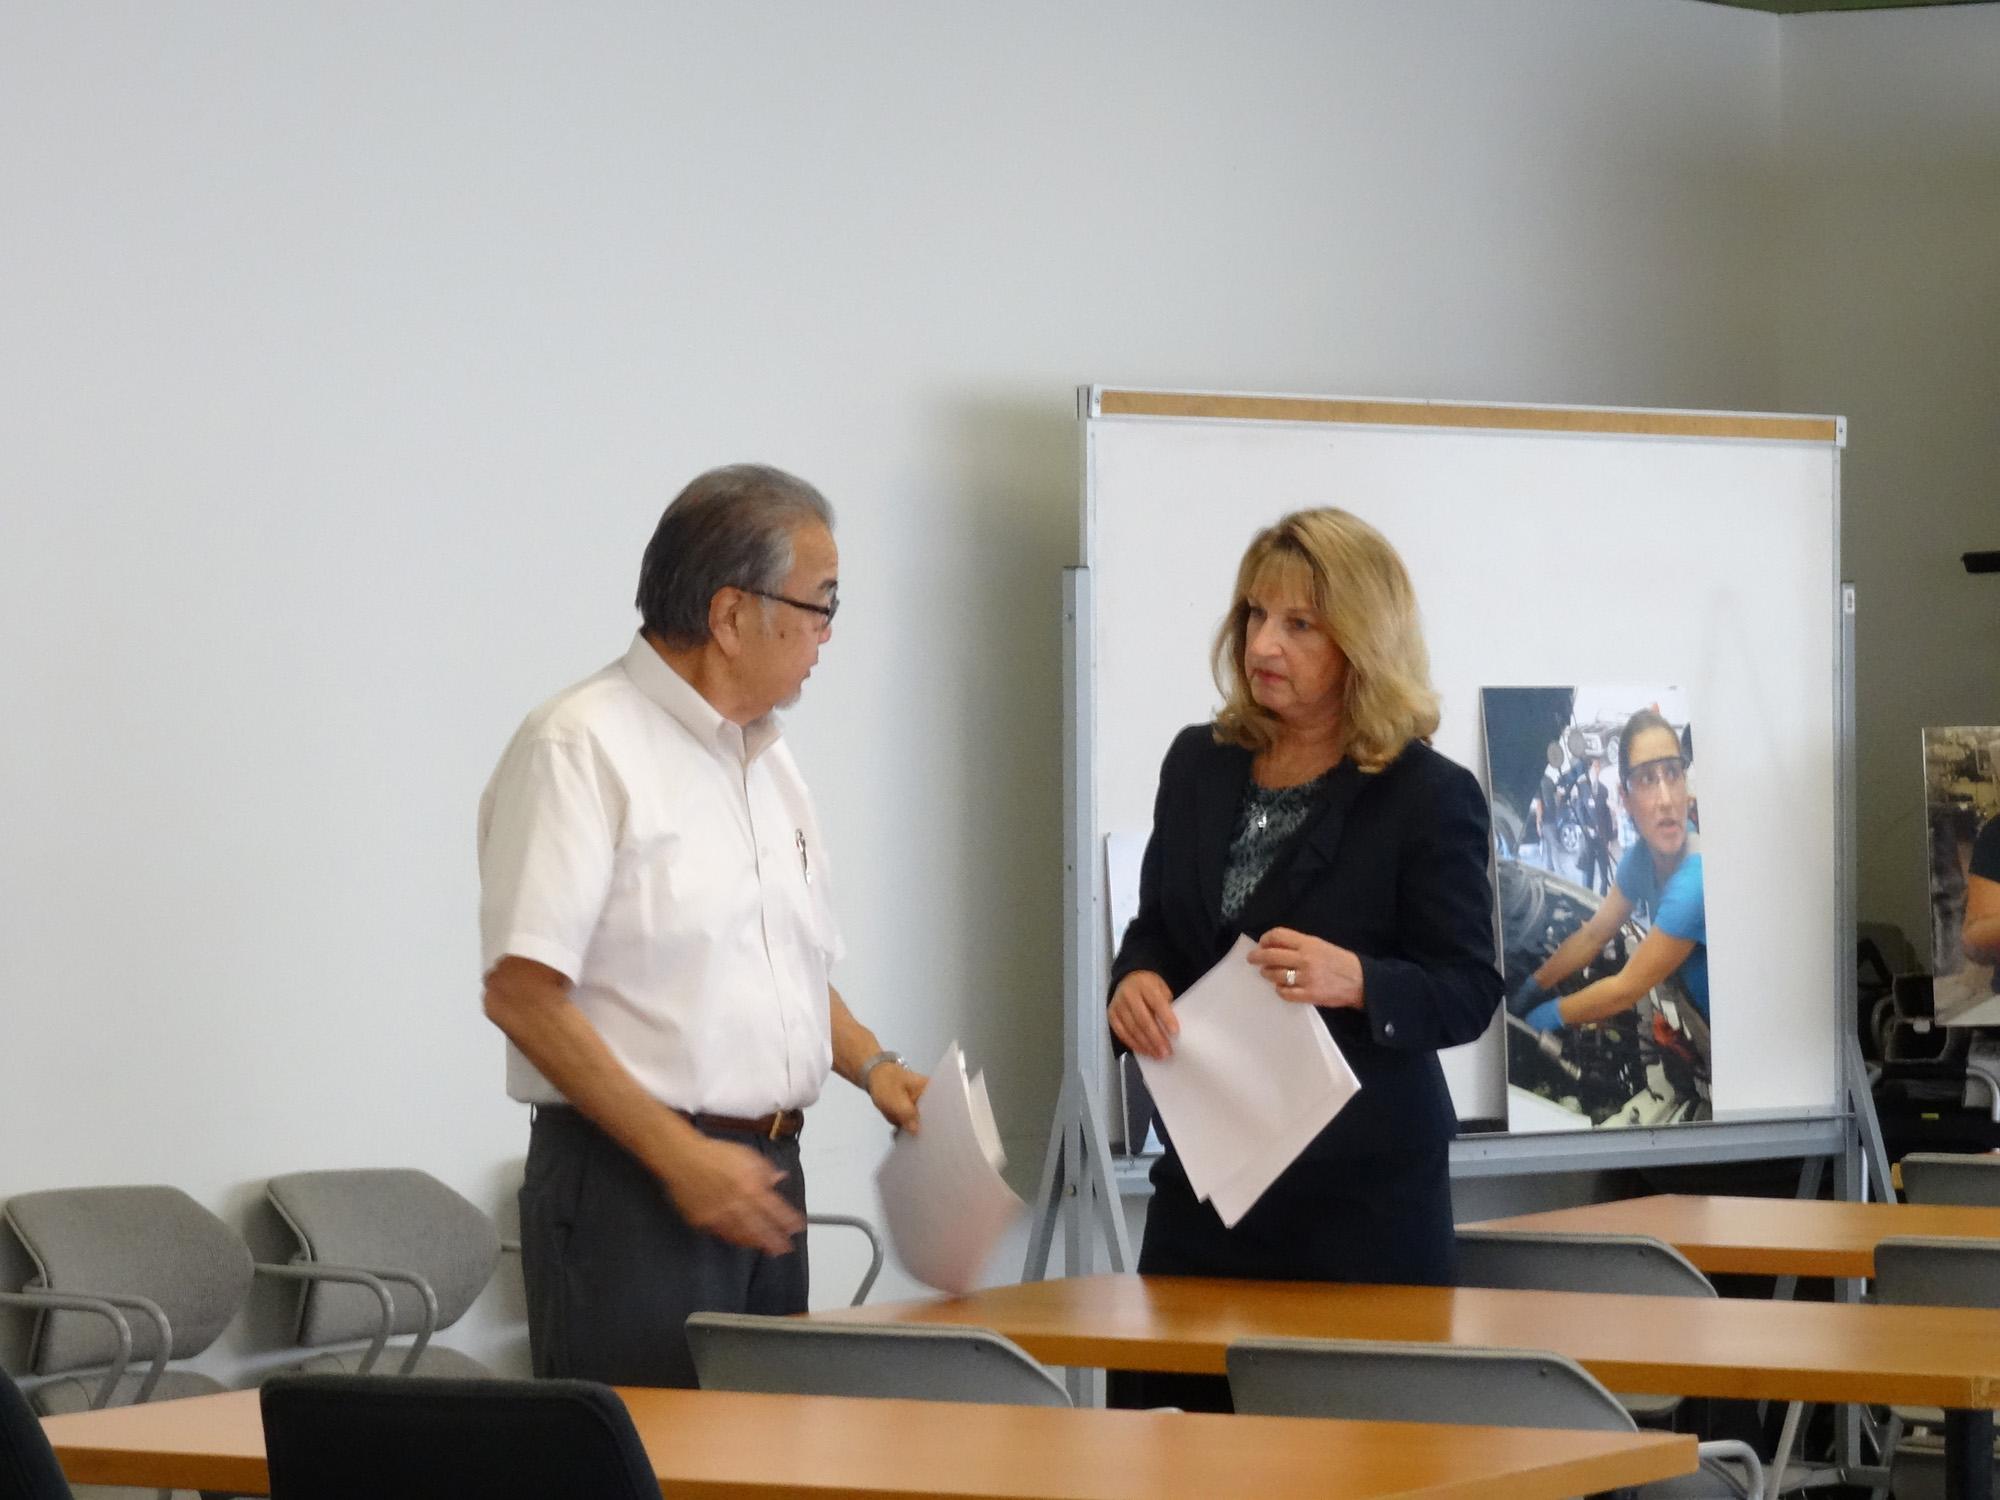 LARAEC-Partners-Meeting-06-06-14-02